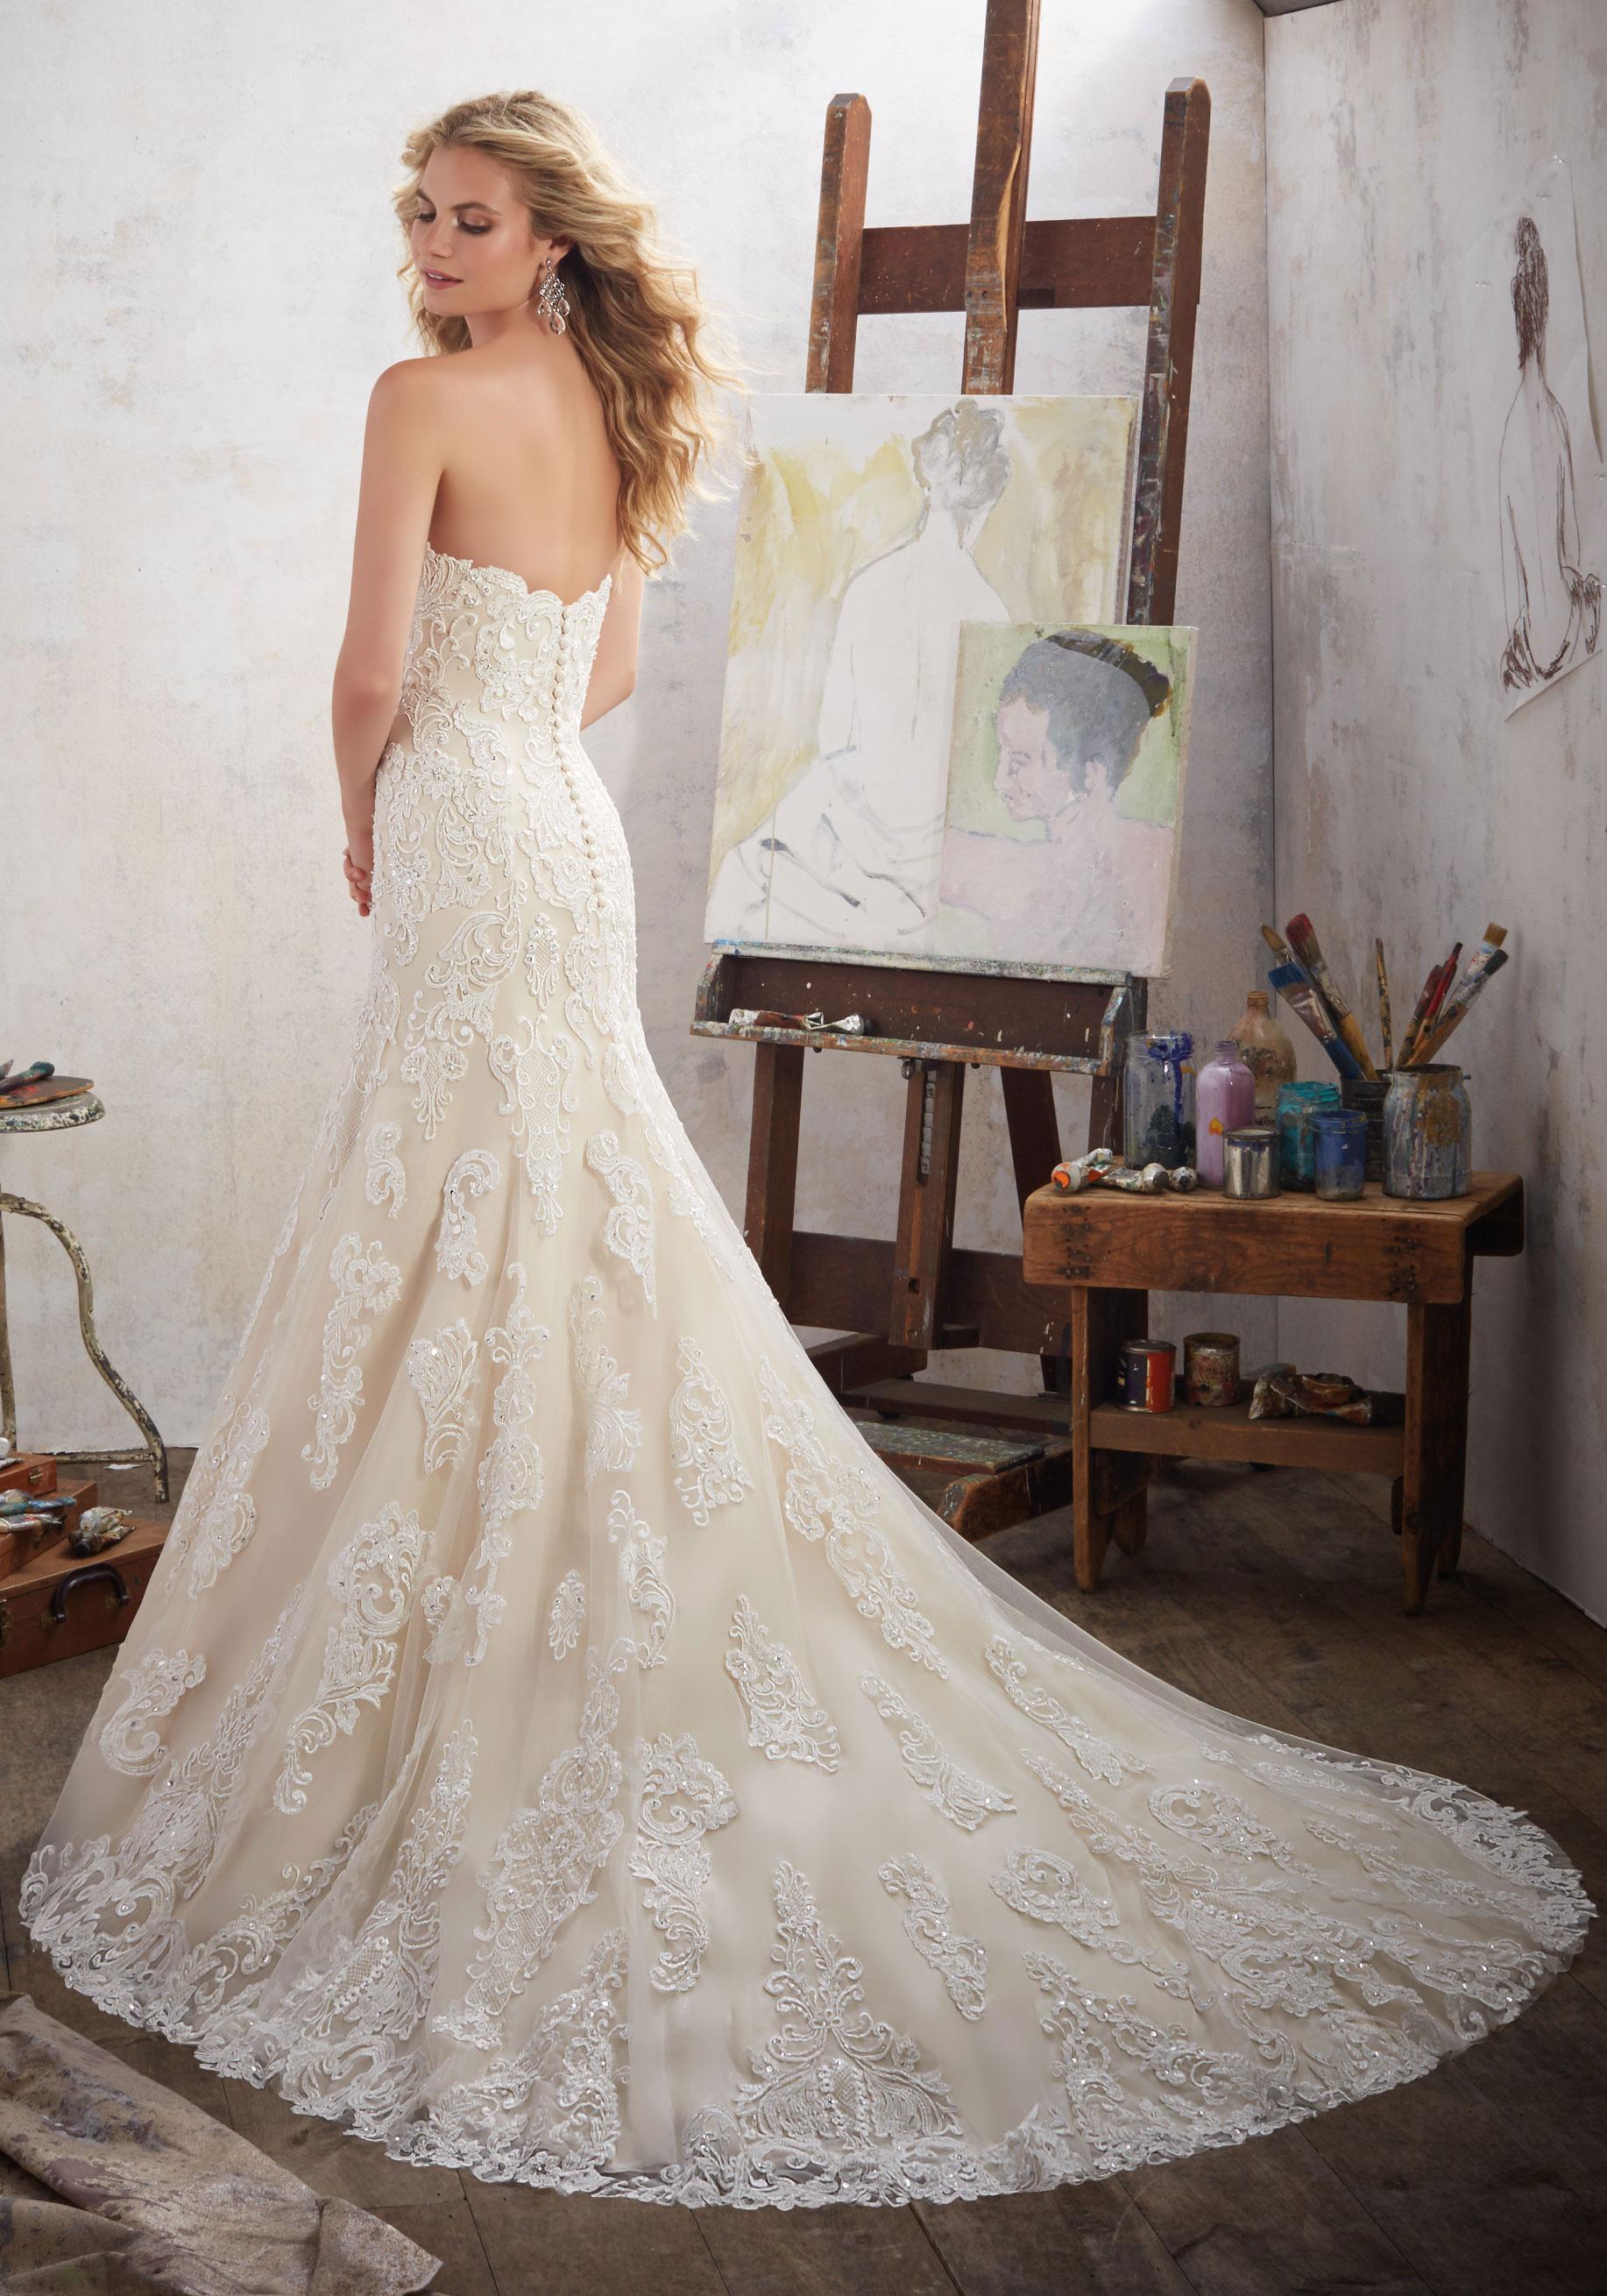 mermaid wedding dresses with sweetheart neckline photo - 1